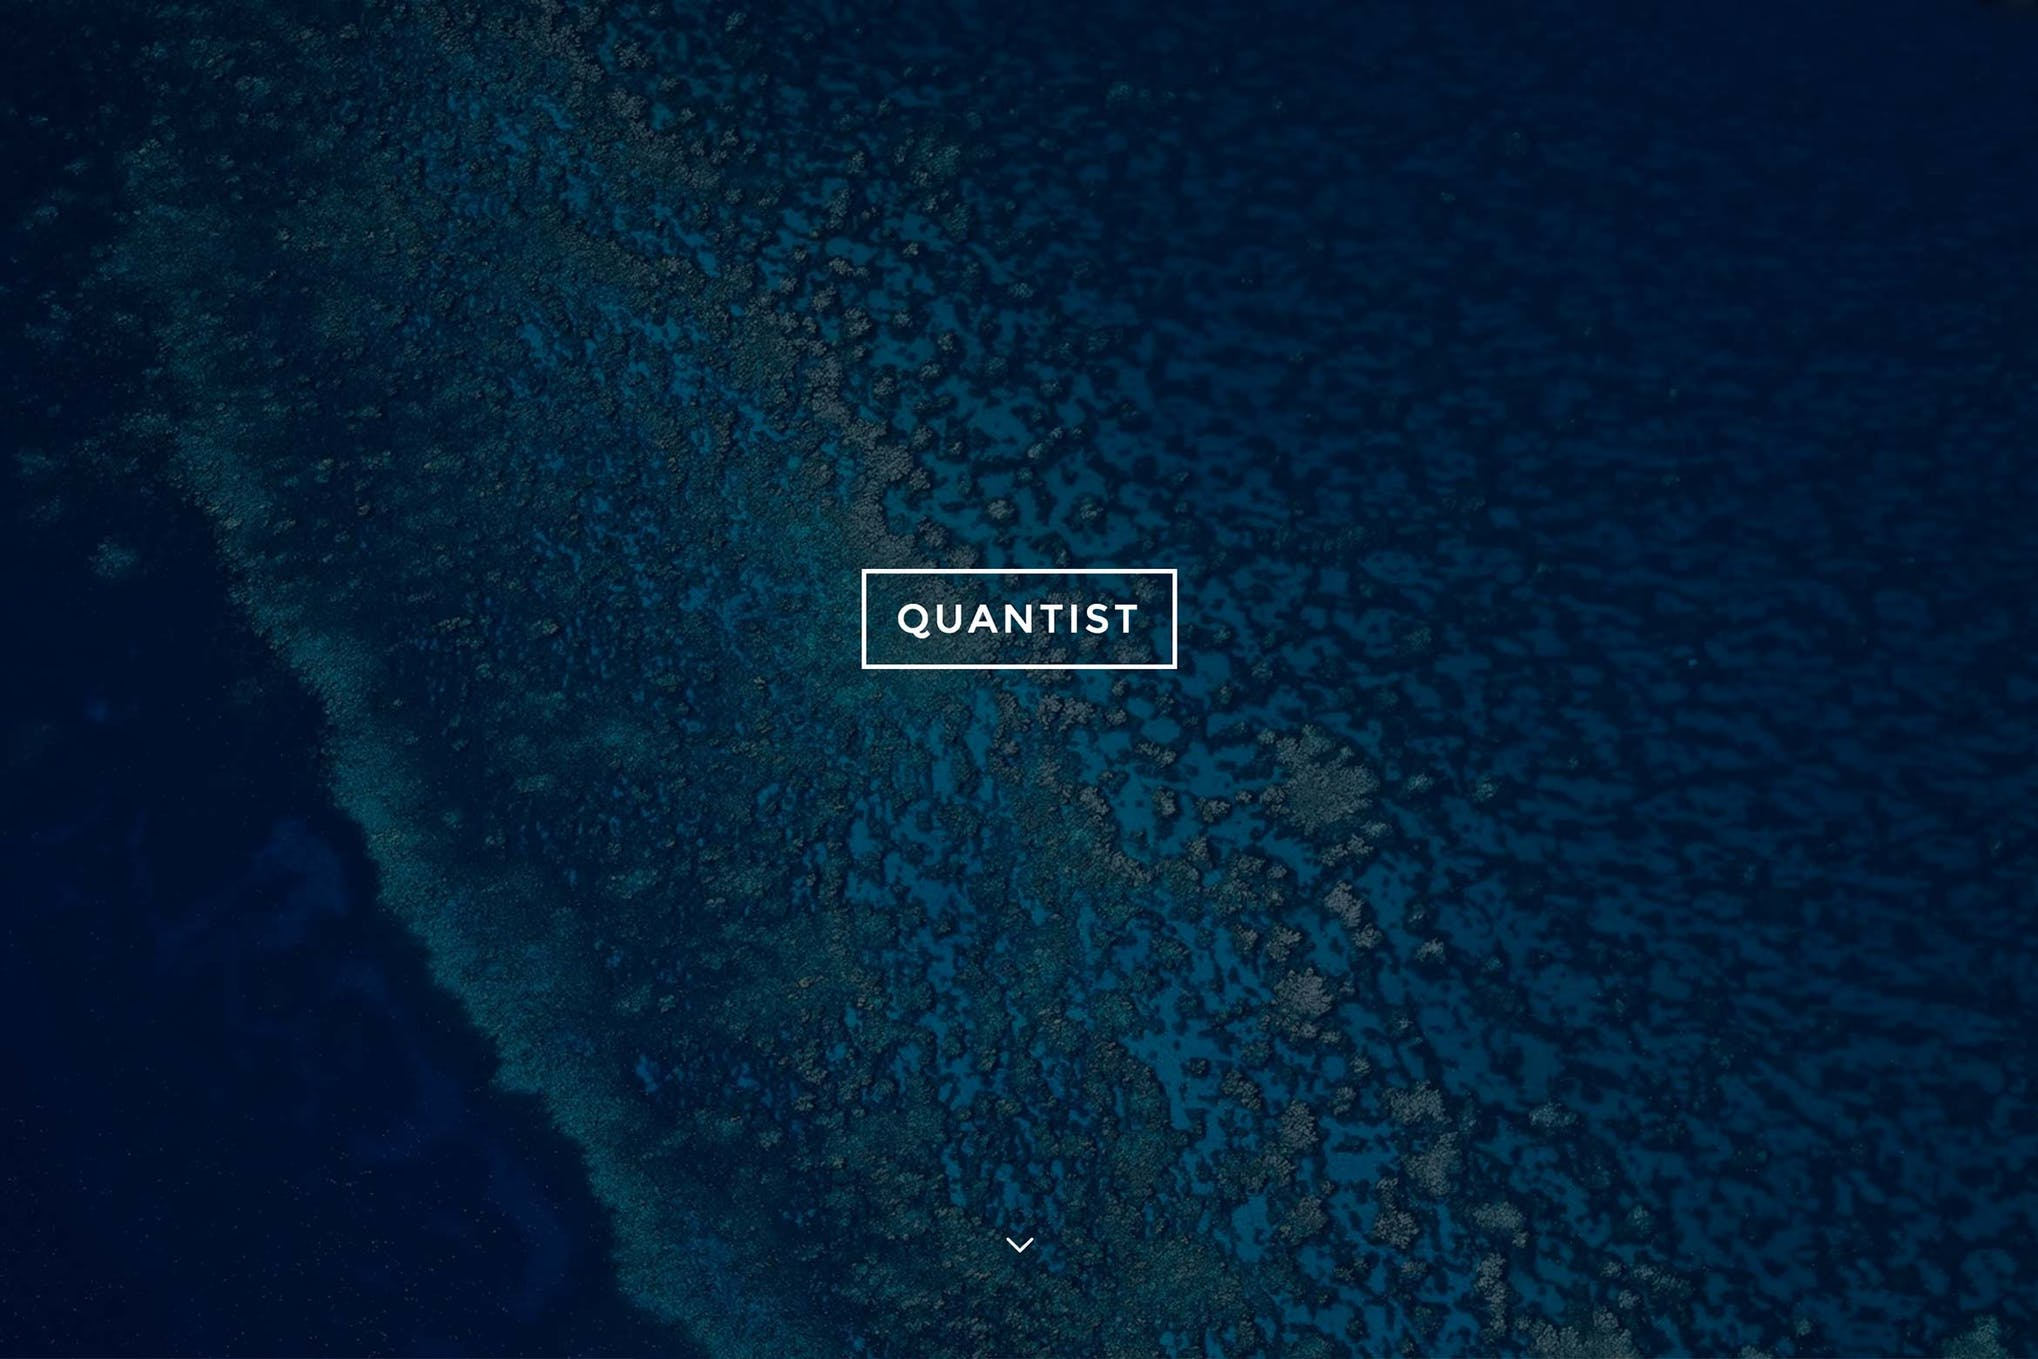 Quantist - A Responsive Fullscreen Cover Theme